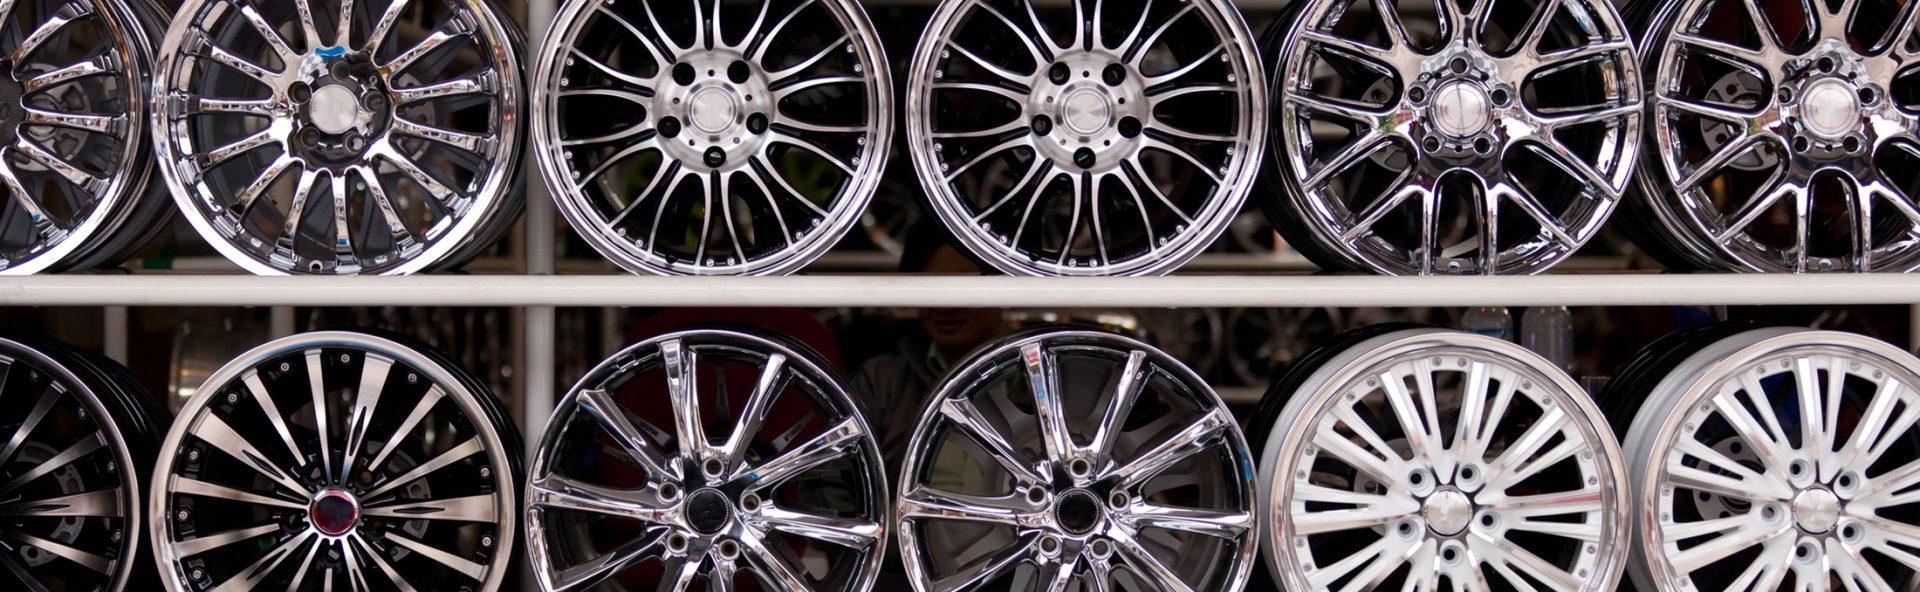 Mags et roues garage mécanique tirecraft